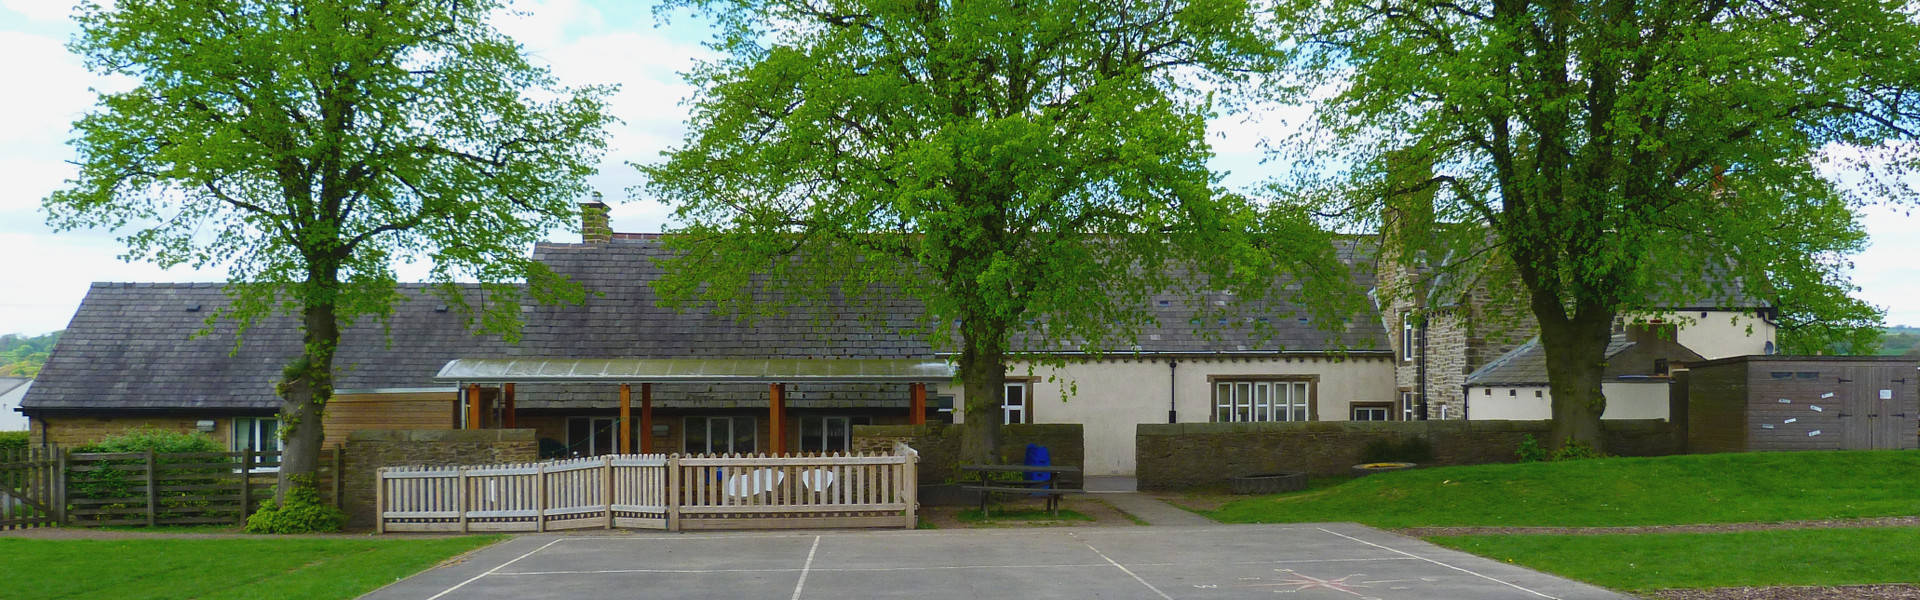 Altham St. James Church Of England Primary School | Burnley Road, Accrington BB5 5UH | +44 1282 772174